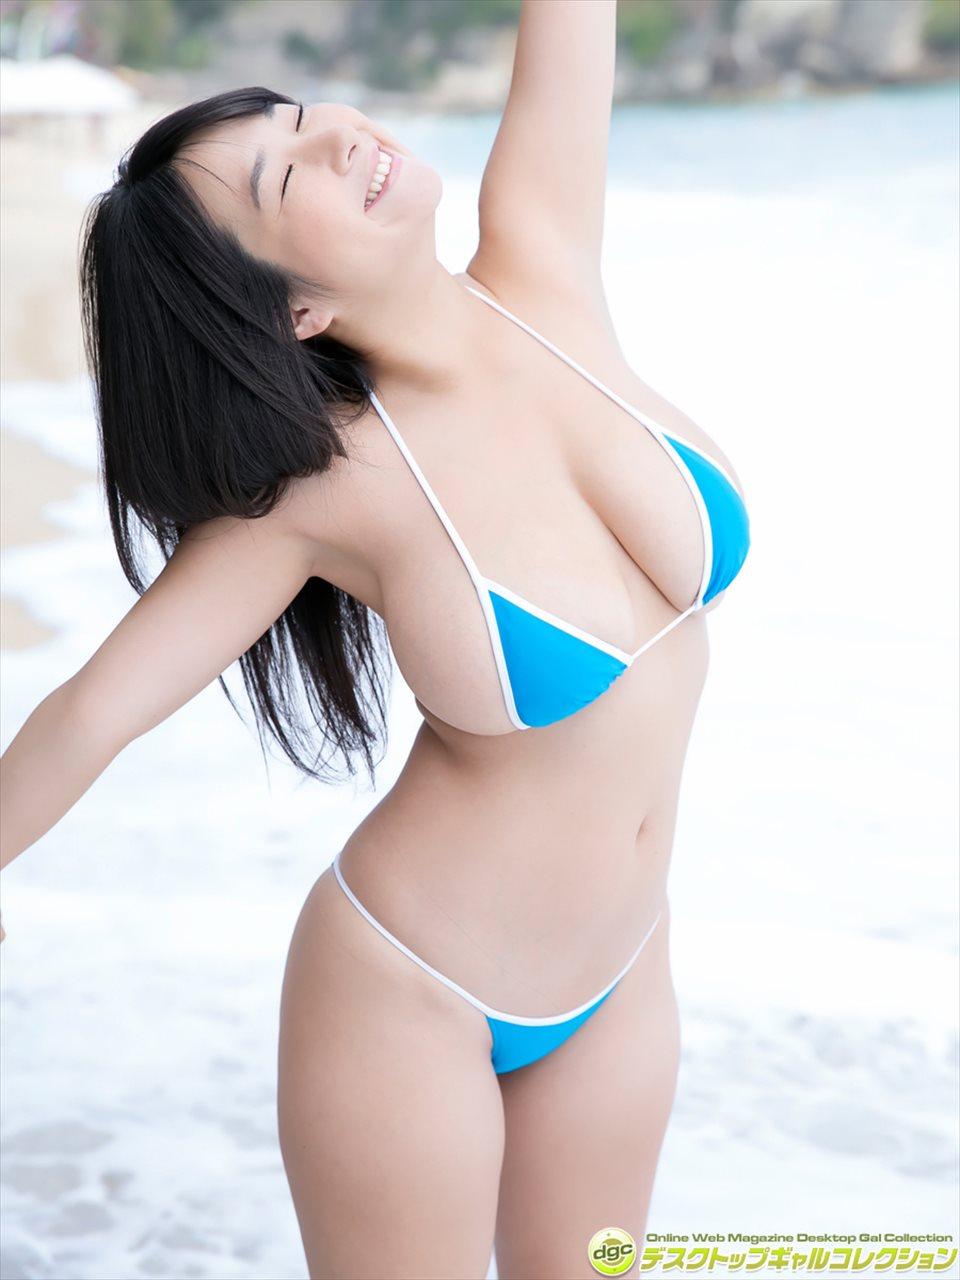 Kiriyama Rui 桐山瑠衣